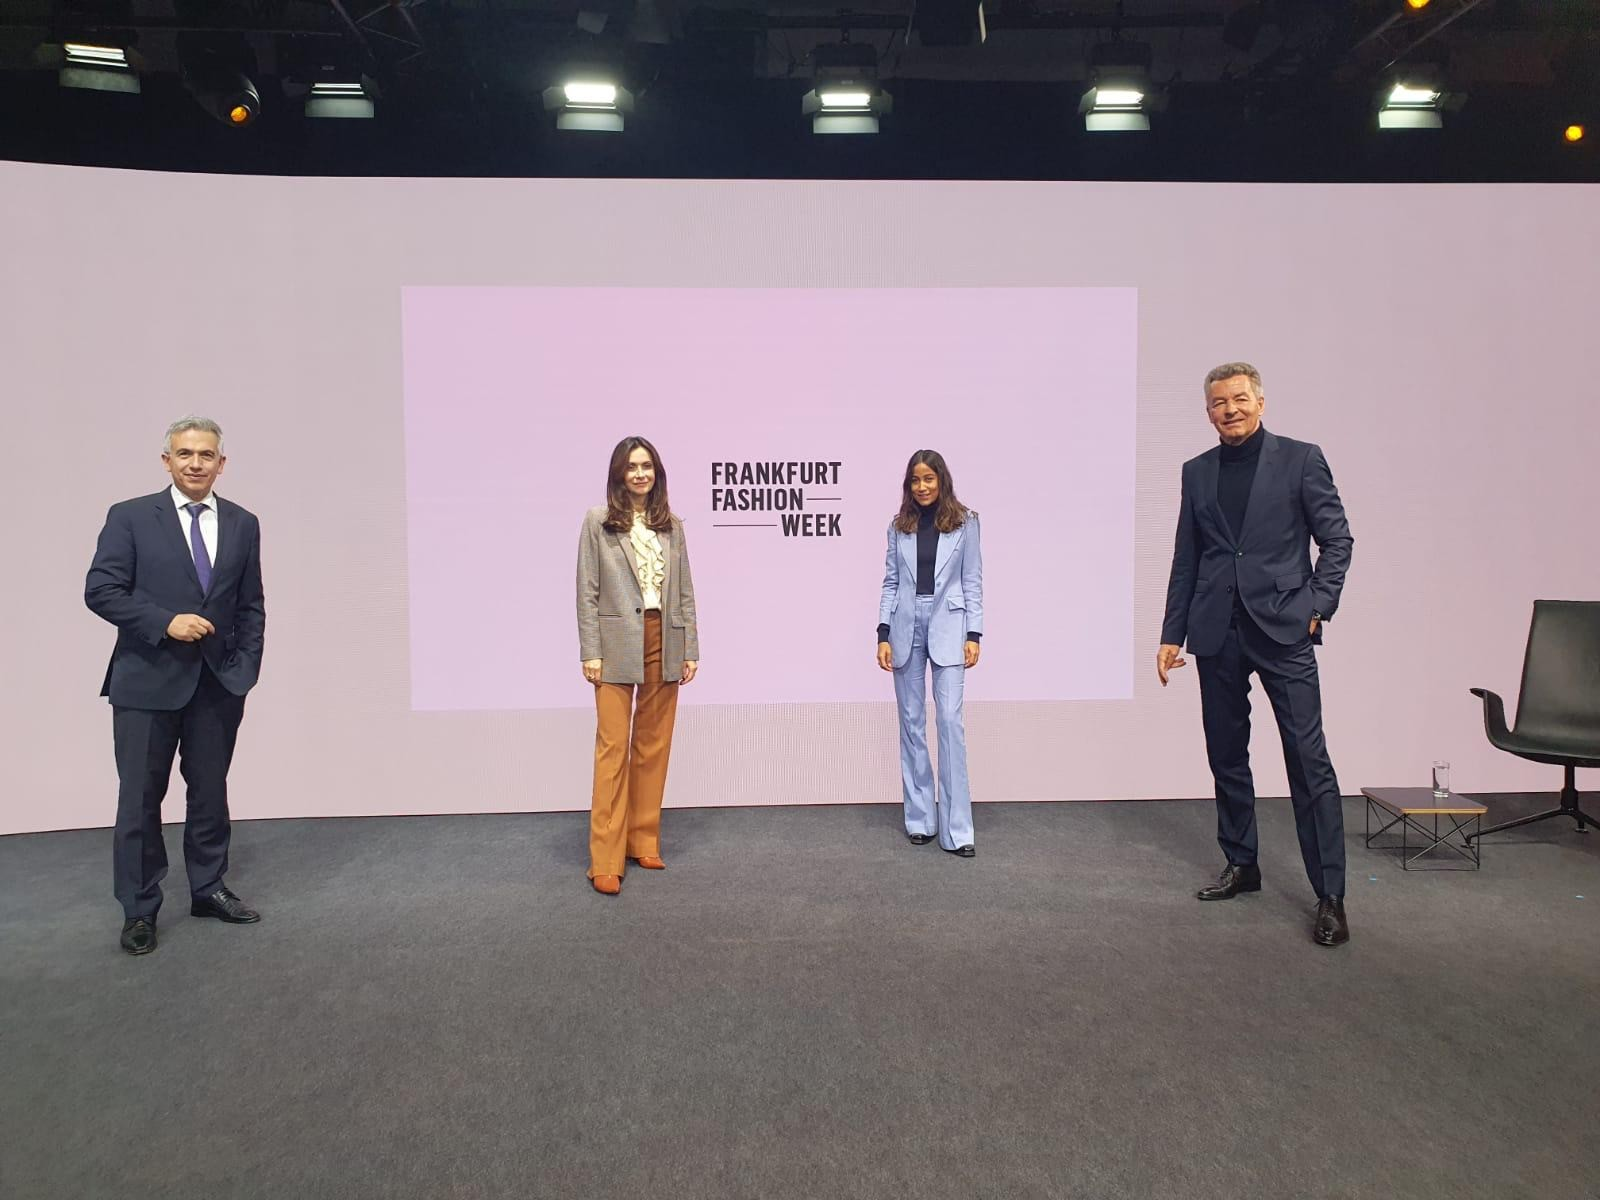 Fashion Week, Menschen, Frau, Frauen, Mann, Männer, Mode